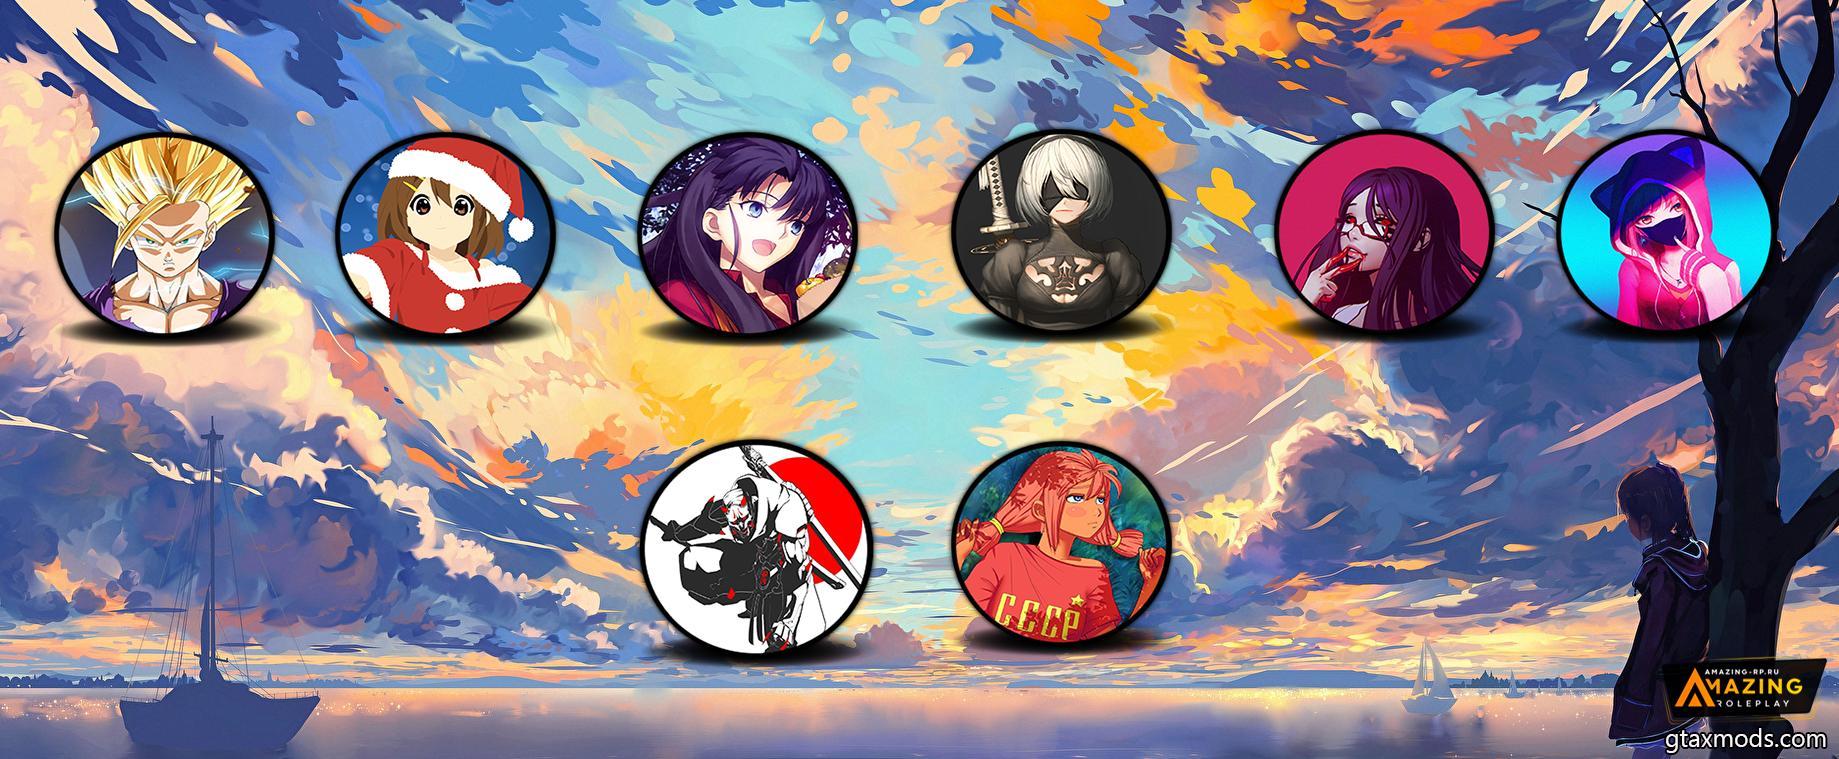 Anime Fist Pack